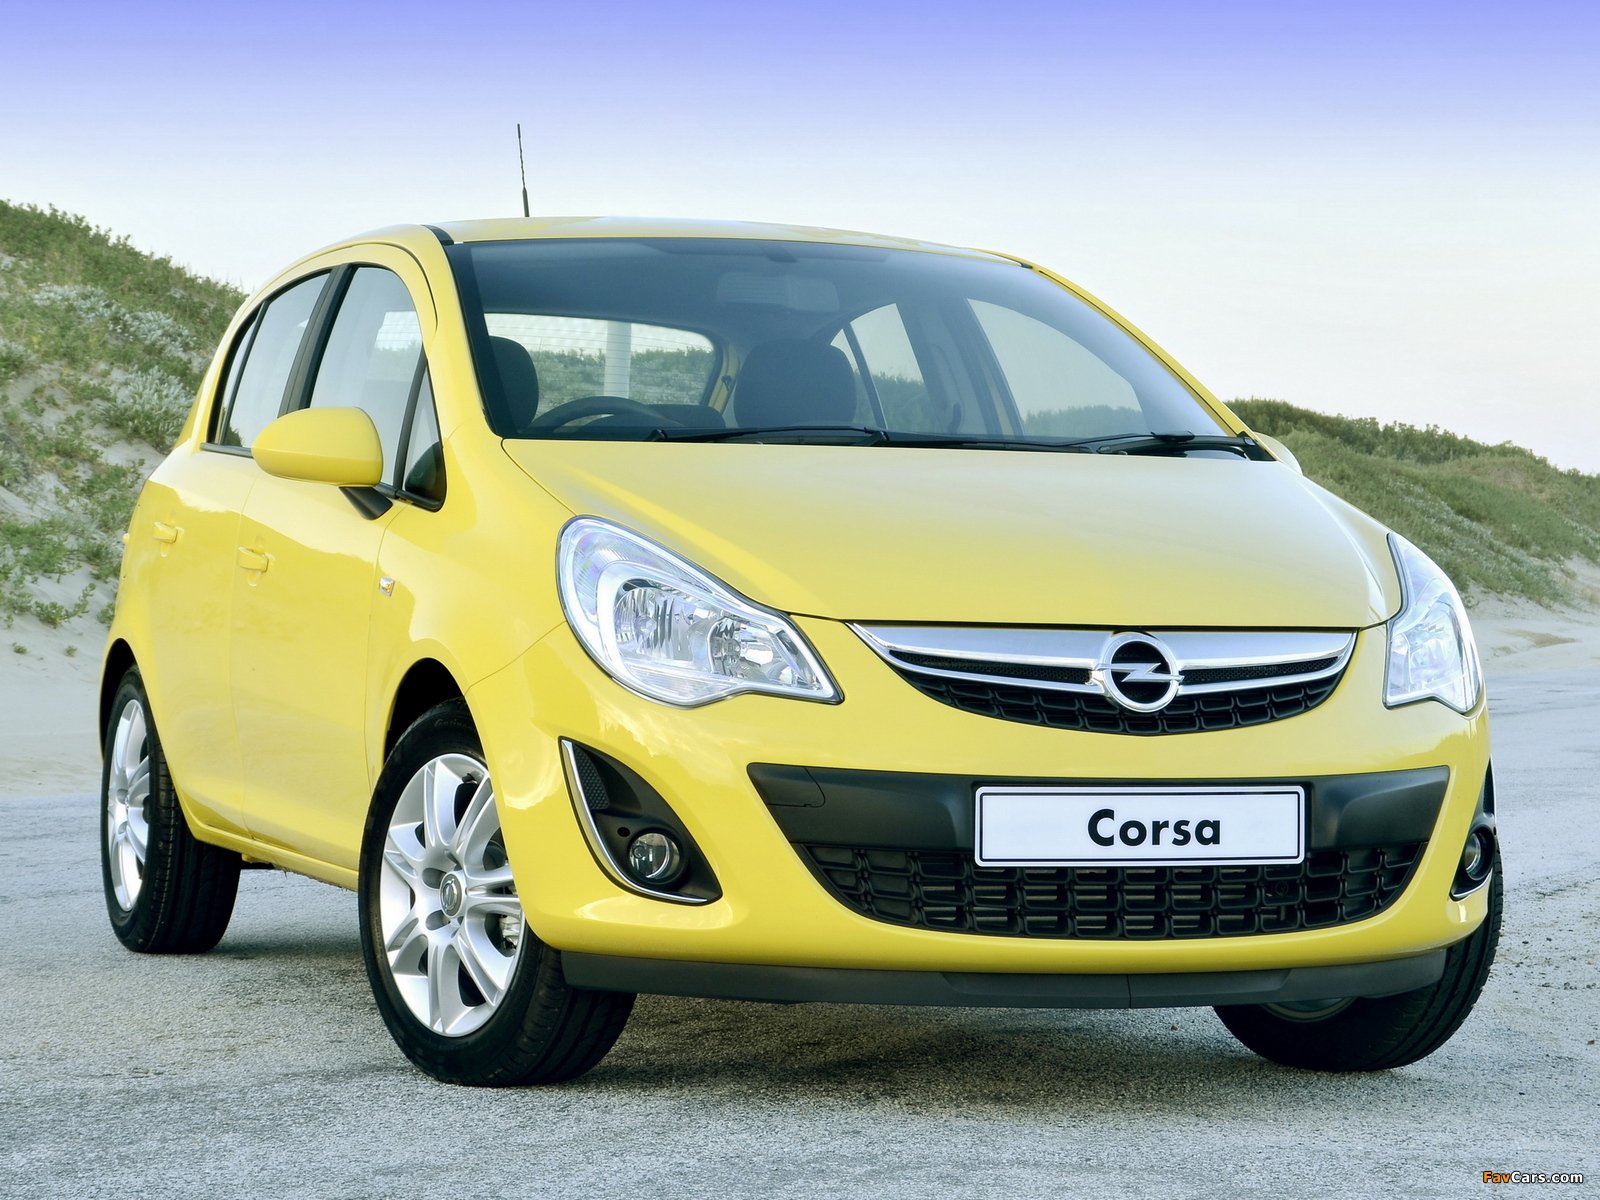 Opel Corsa Turbo 5-door ZA-spec (D) 2013 photos (1600 x 1200)